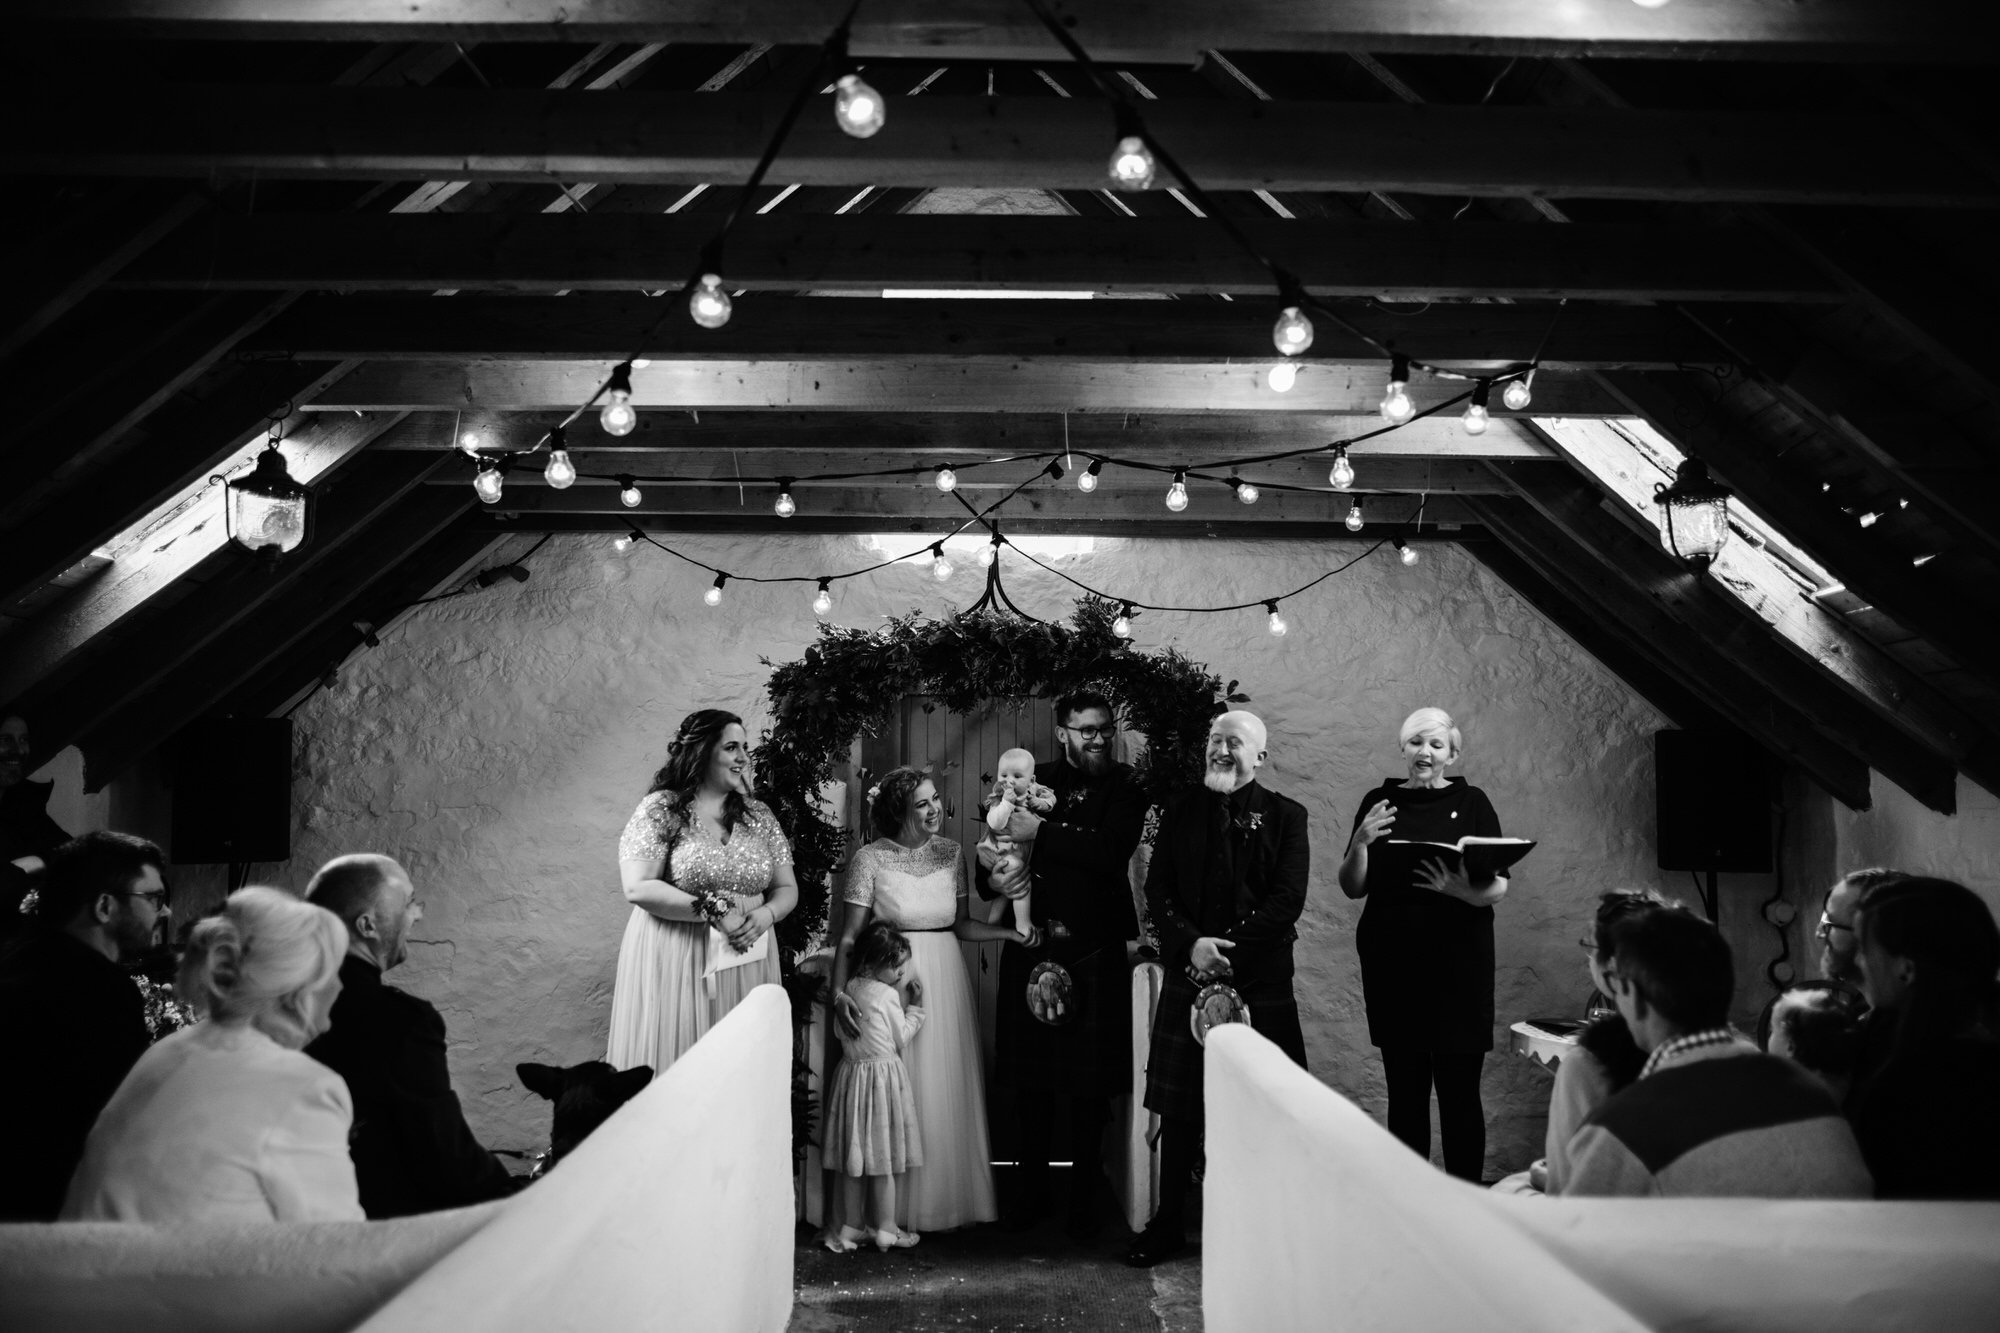 021 TIN SHED KNOCKRAICH WEDDING AUSTRIAN SCOTTISH ZOE ALEXANDRA PHOTOGRAPHY